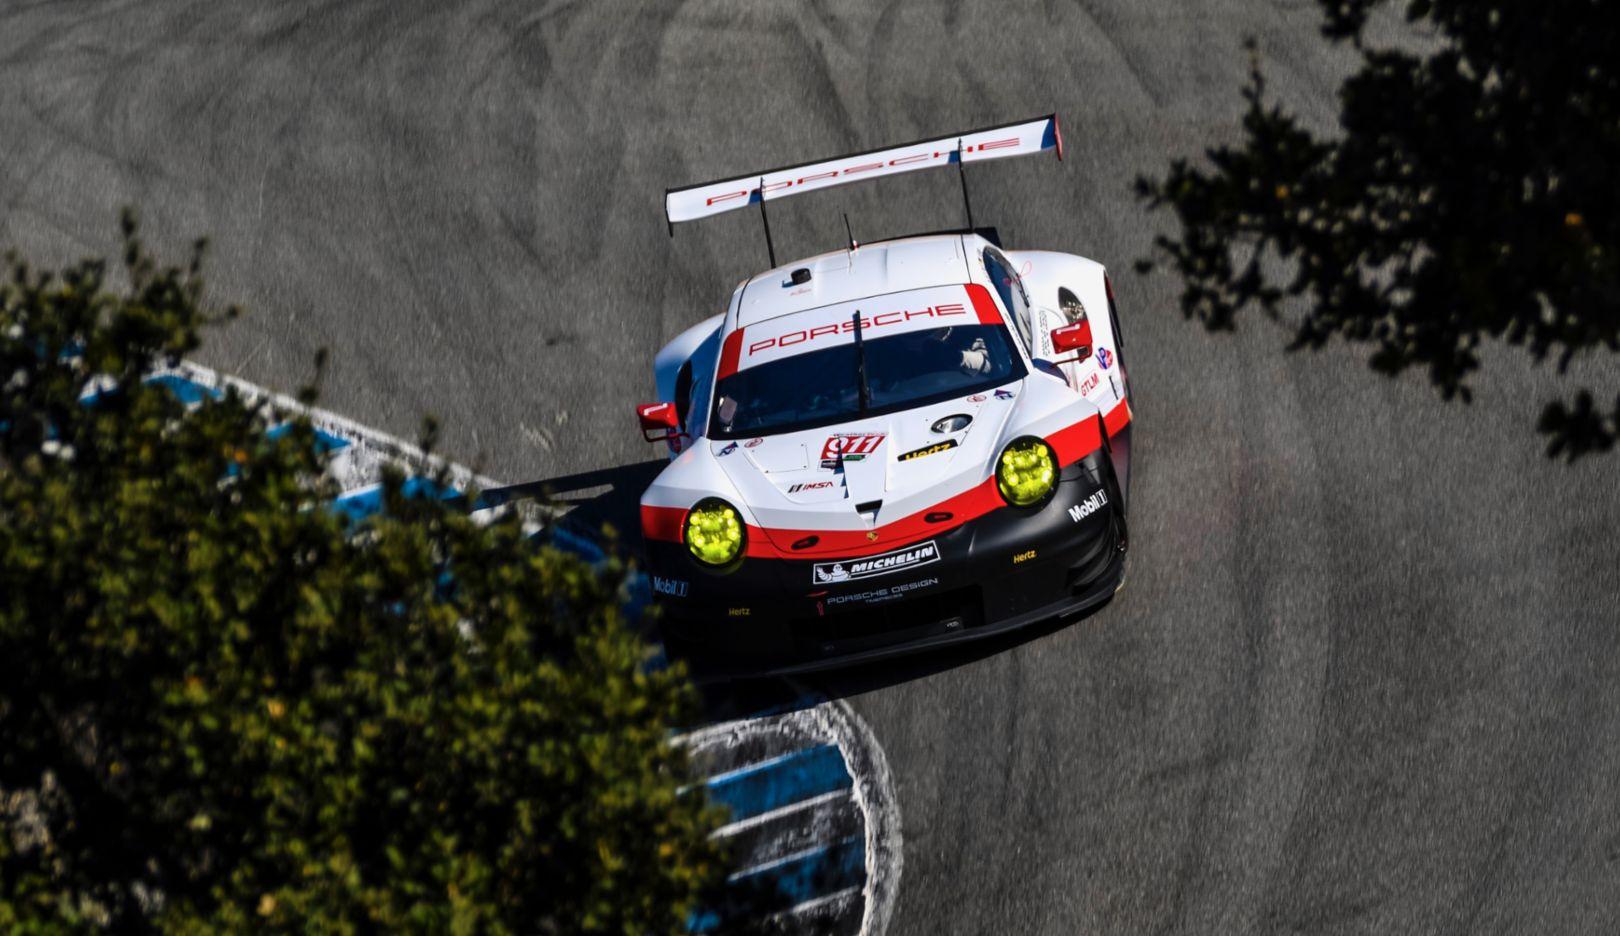 911 RSR, Qualifying, IMSA WeatherTech SportsCar Championship, Laguna Seca/USA, 2017, Porsche AG